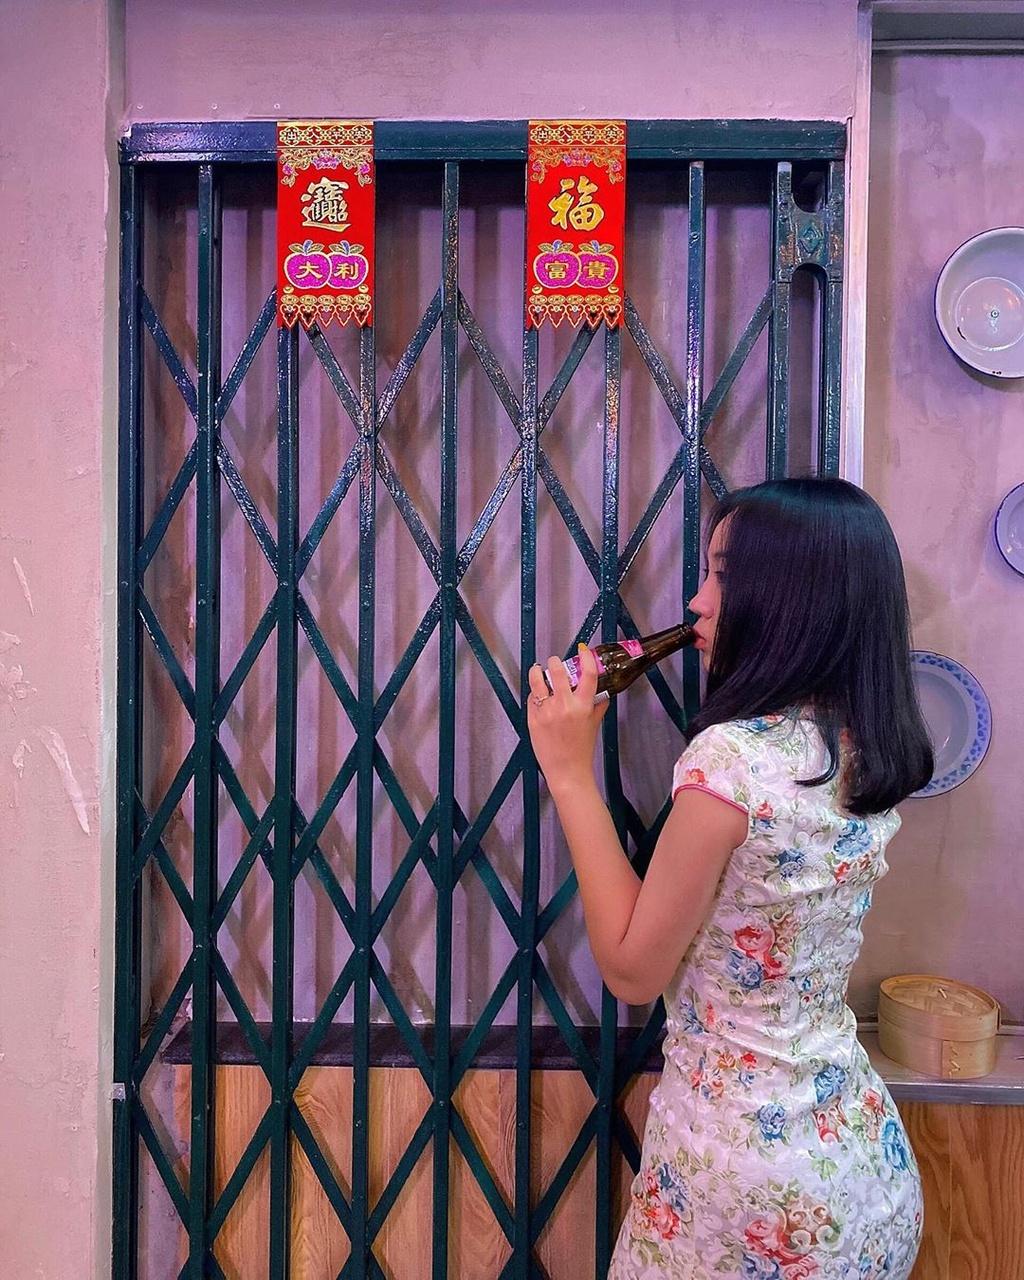 Thoa suc check-in tai 3 tiem ca phe view dep o Vung Tau hinh anh 5 81443544_2539304072977608_6918006959810706311_n.jpg